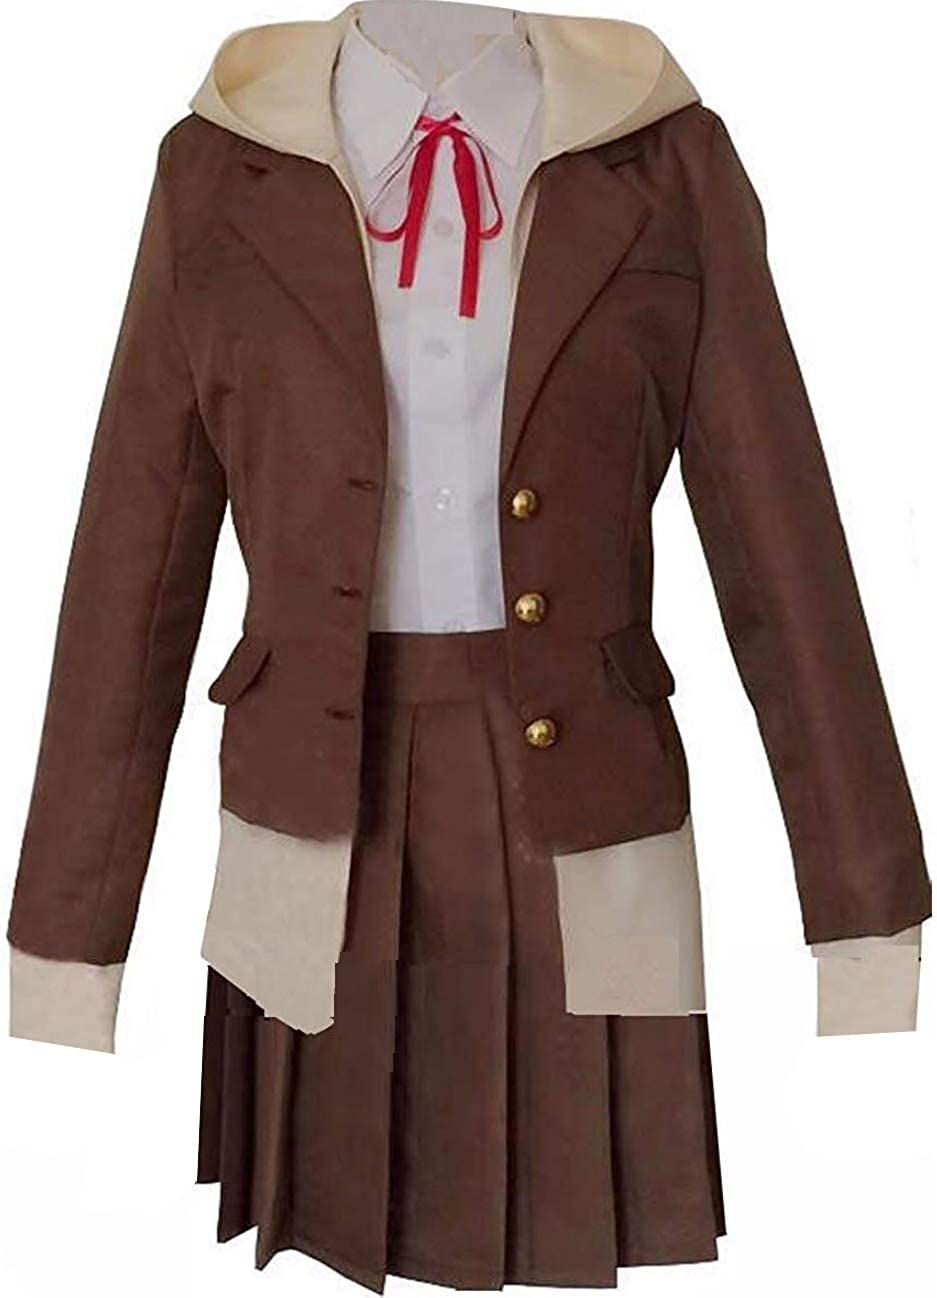 Danganronpa Nanami ChiaKi Schuluniform Cosplay Kostüm Halloween Outfit